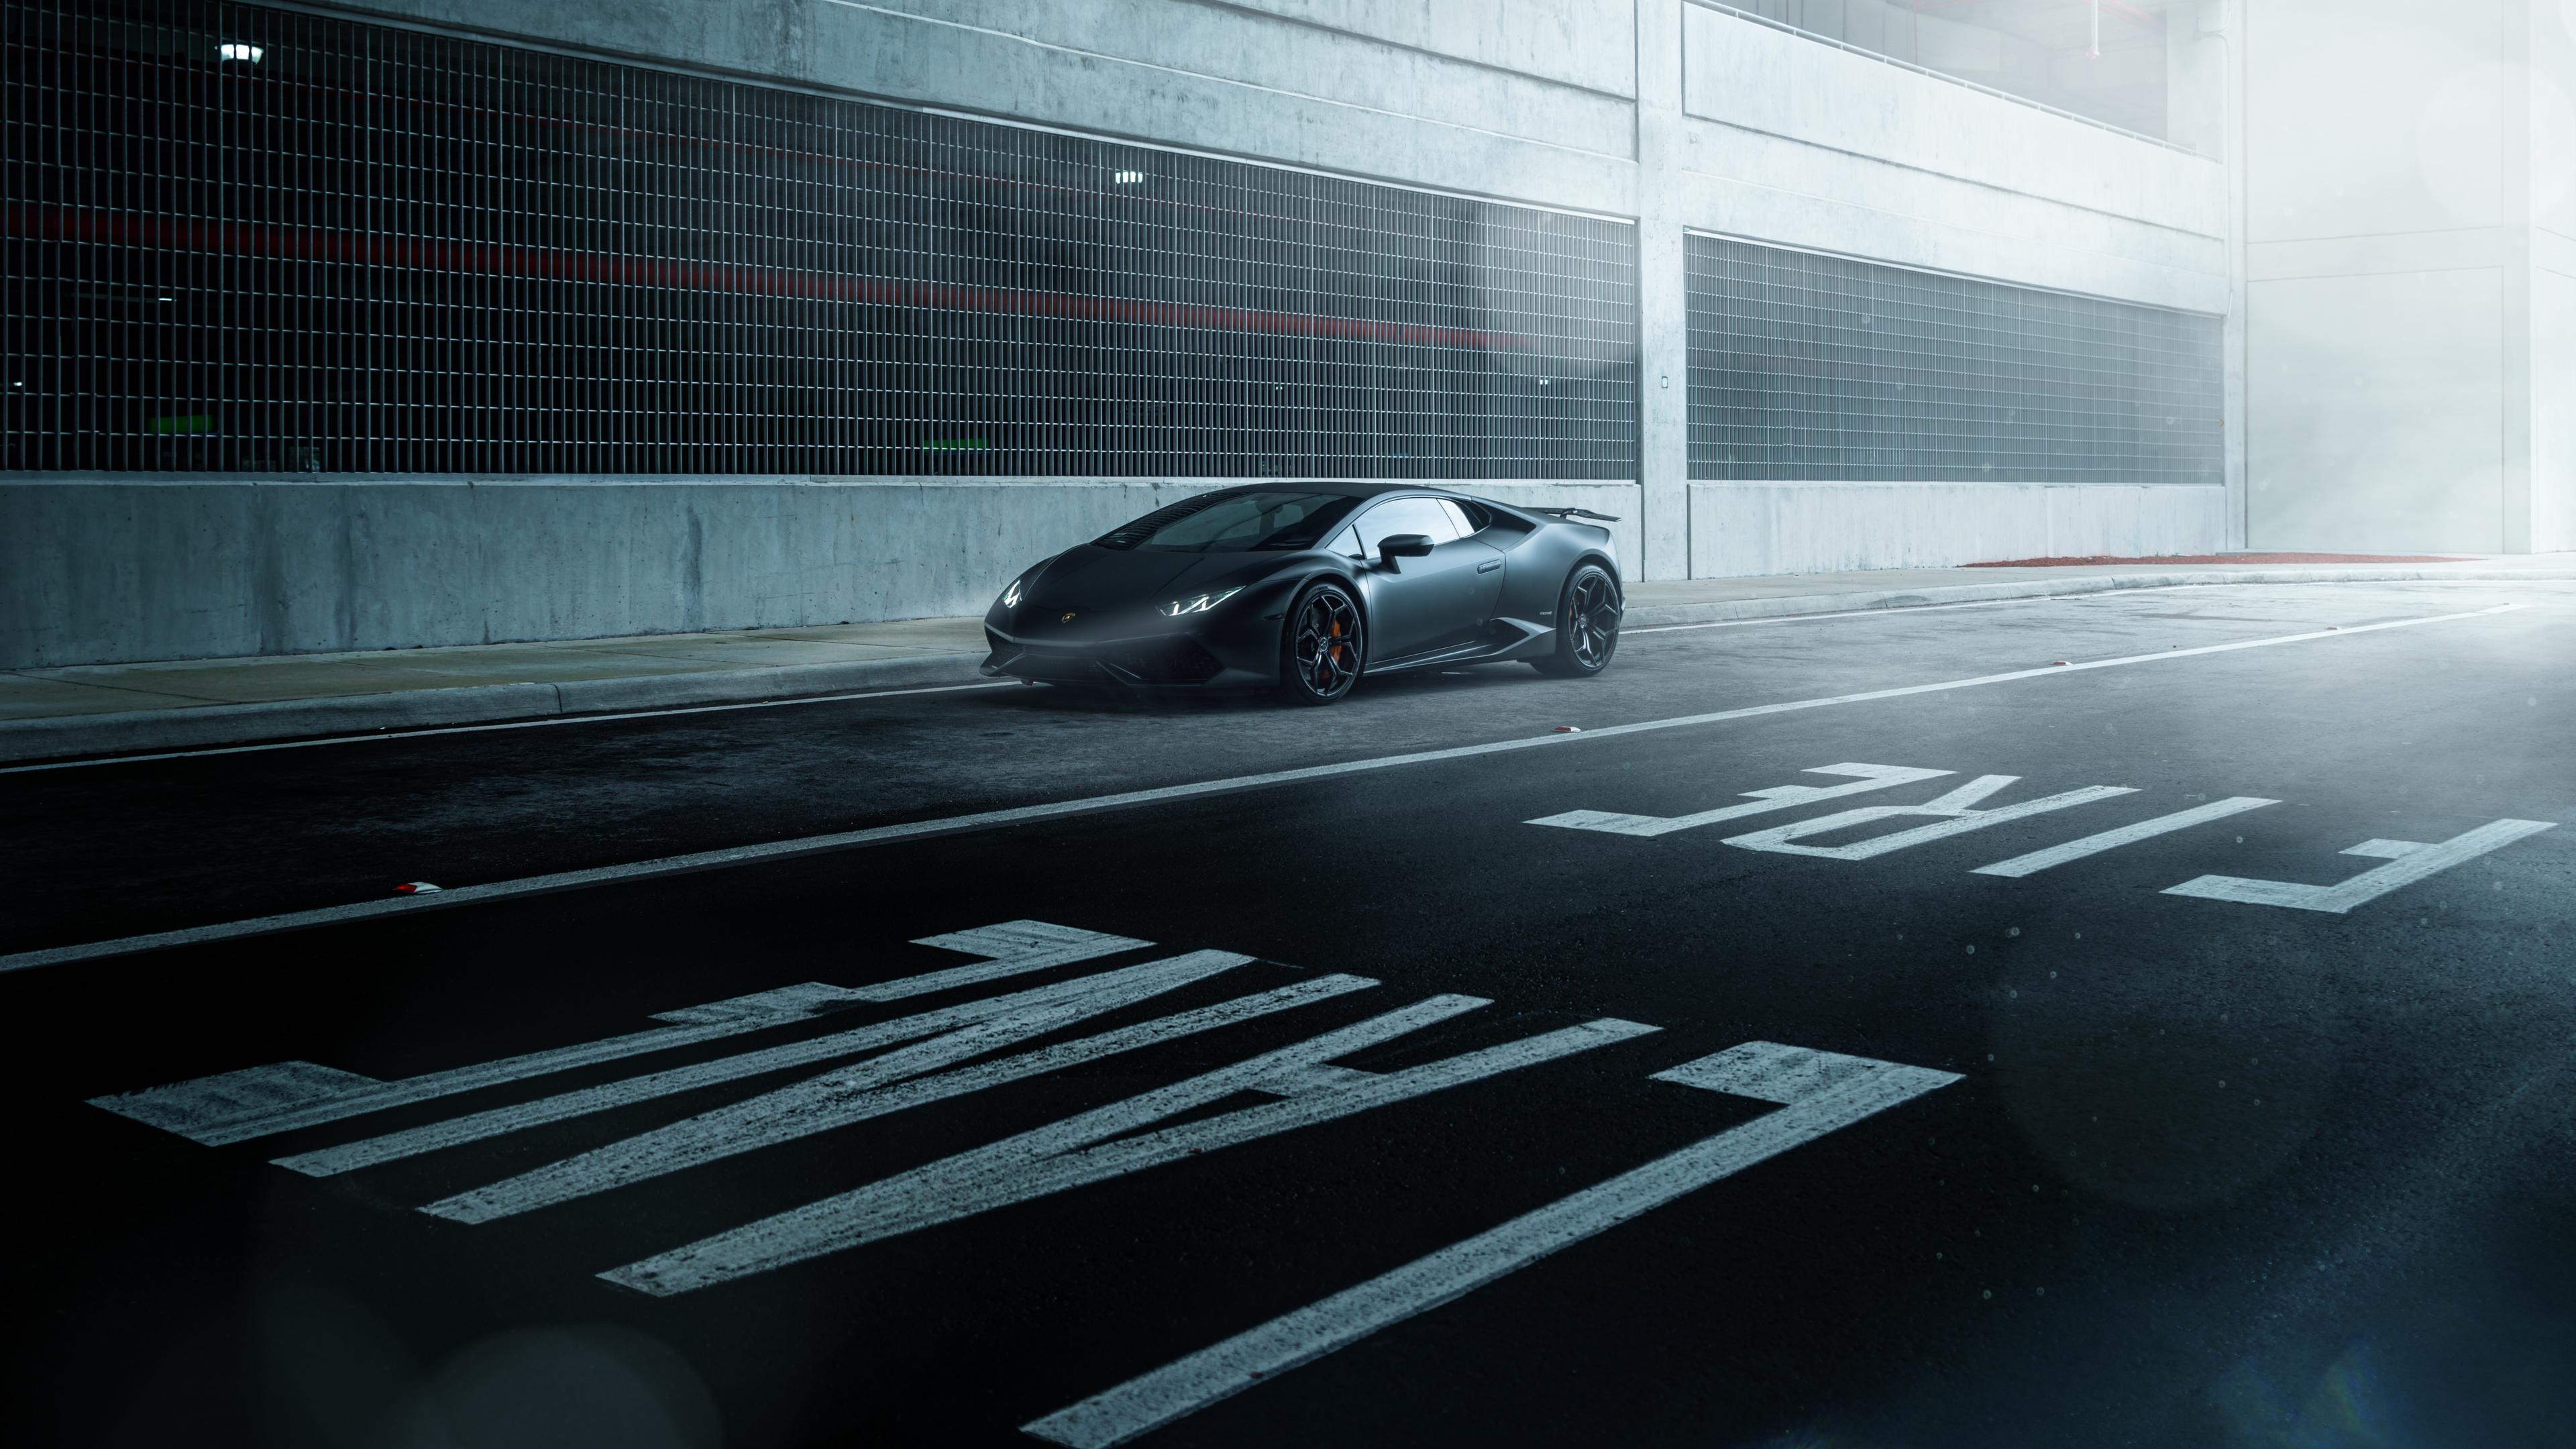 black lamborghini huracan supercar vehicle 1539112158 - Black Lamborghini Huracan Supercar Vehicle - lamborghini wallpapers, lamborghini huracan wallpapers, hd-wallpapers, cars wallpapers, 8k wallpapers, 5k wallpapers, 4k-wallpapers